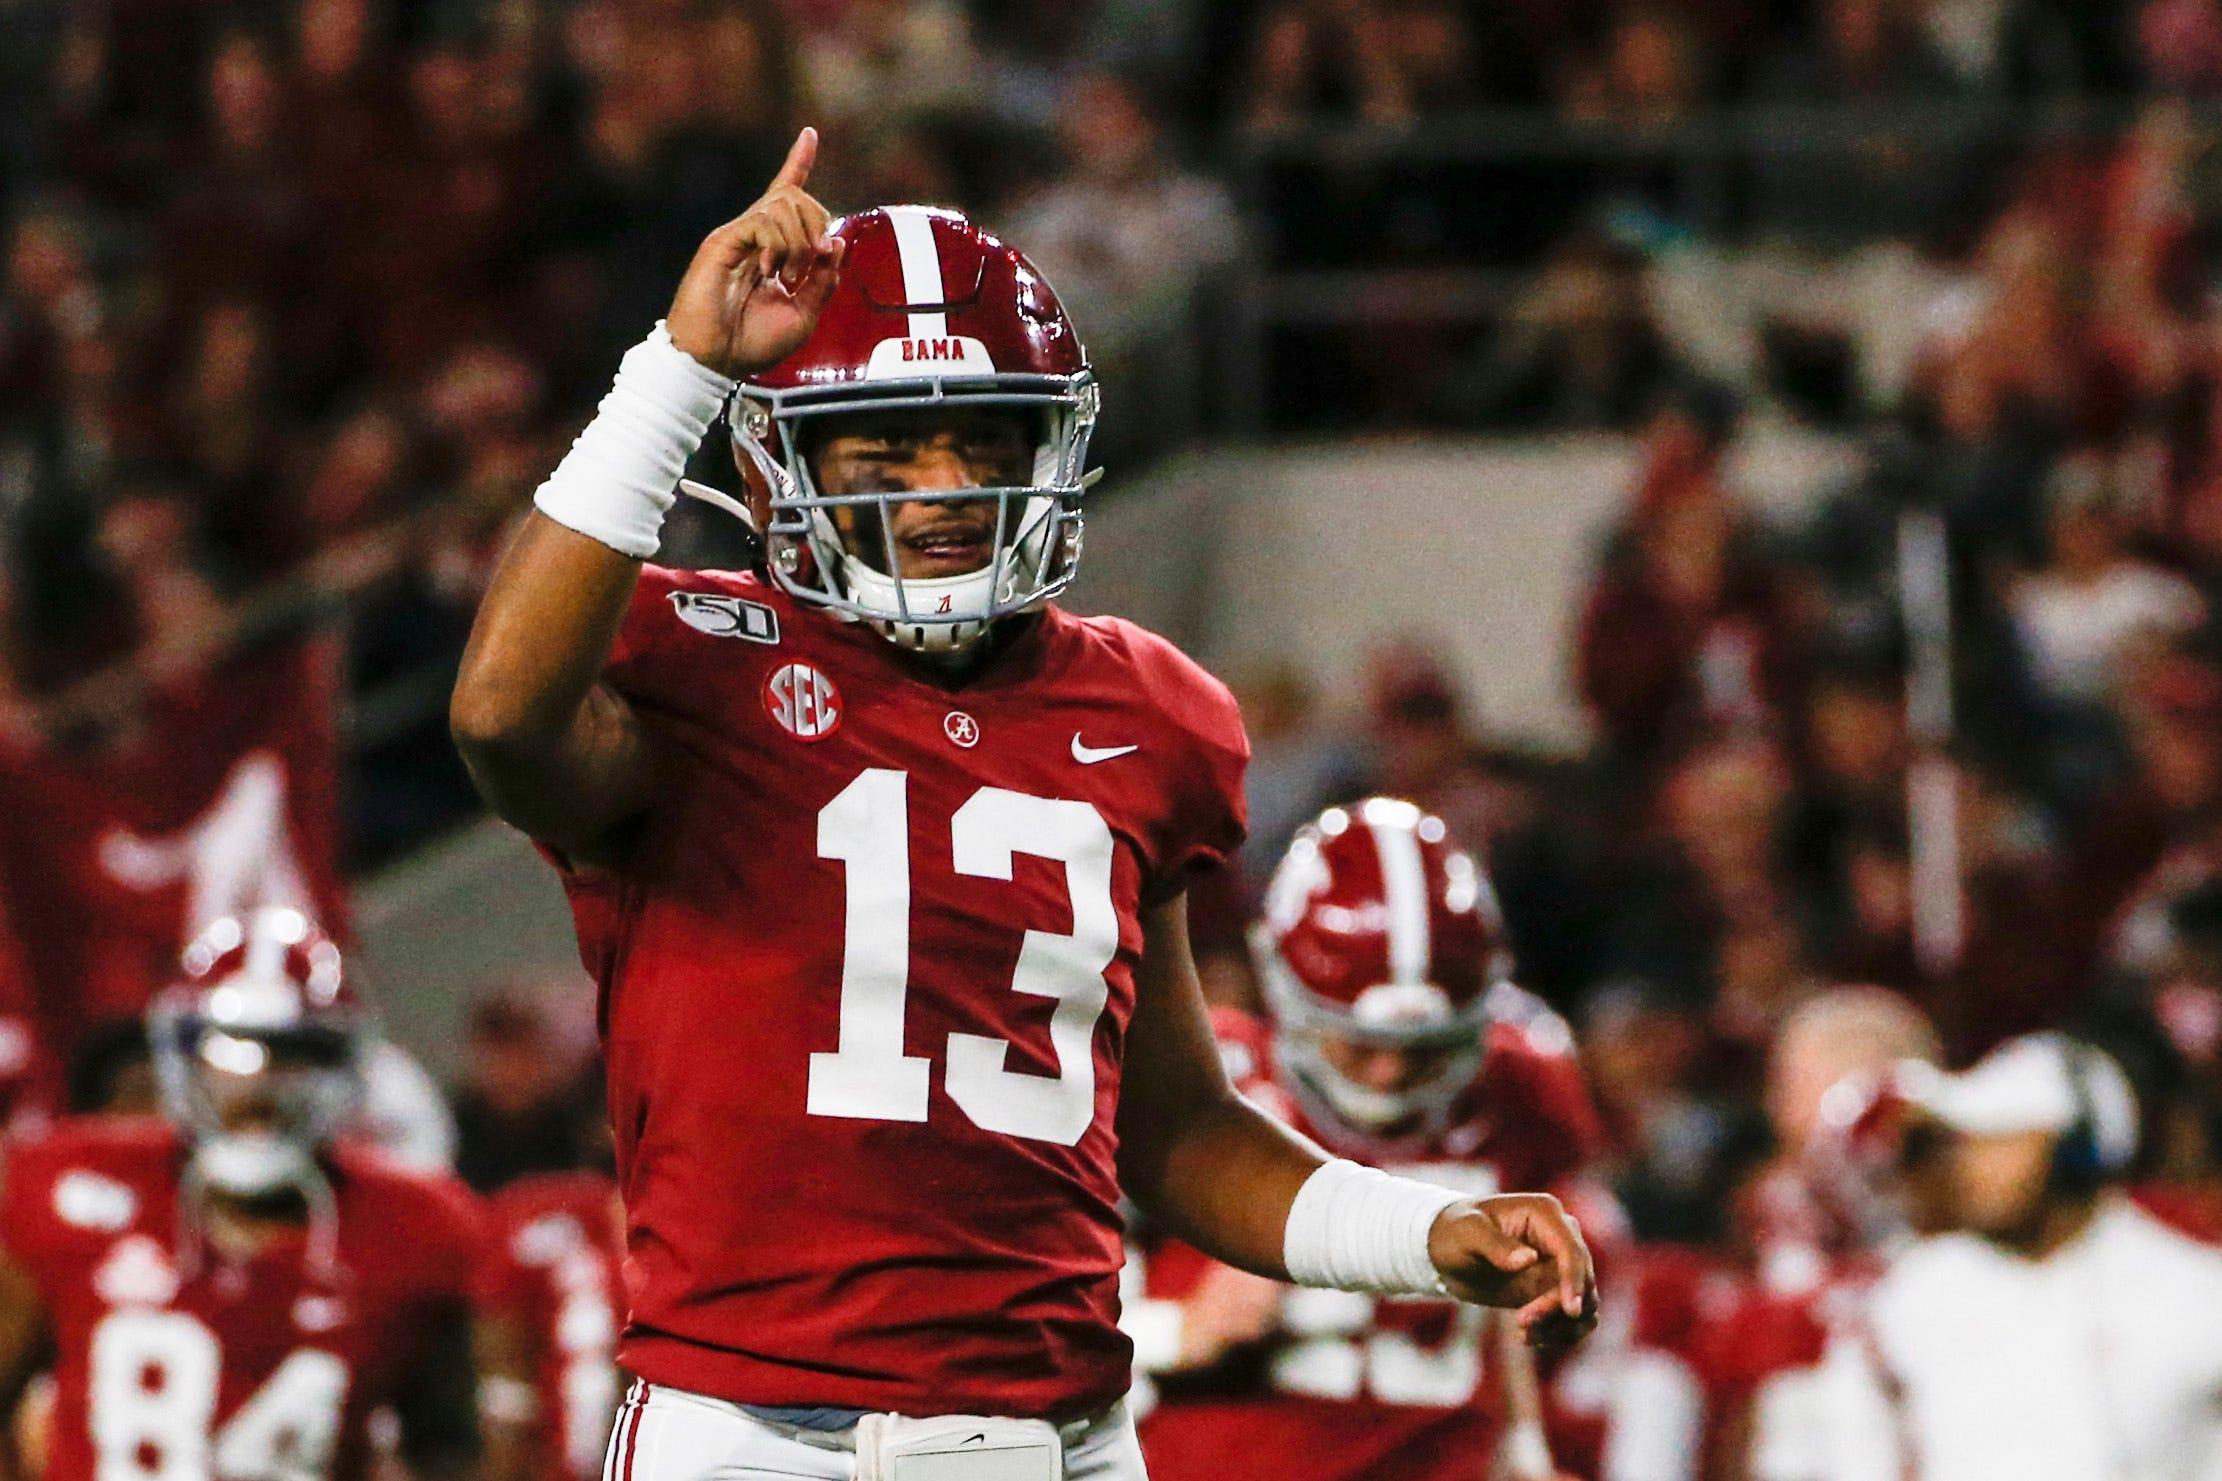 Alabama QB Tua Tagovailoa gets positive outlook on medical recheck before NFL draft